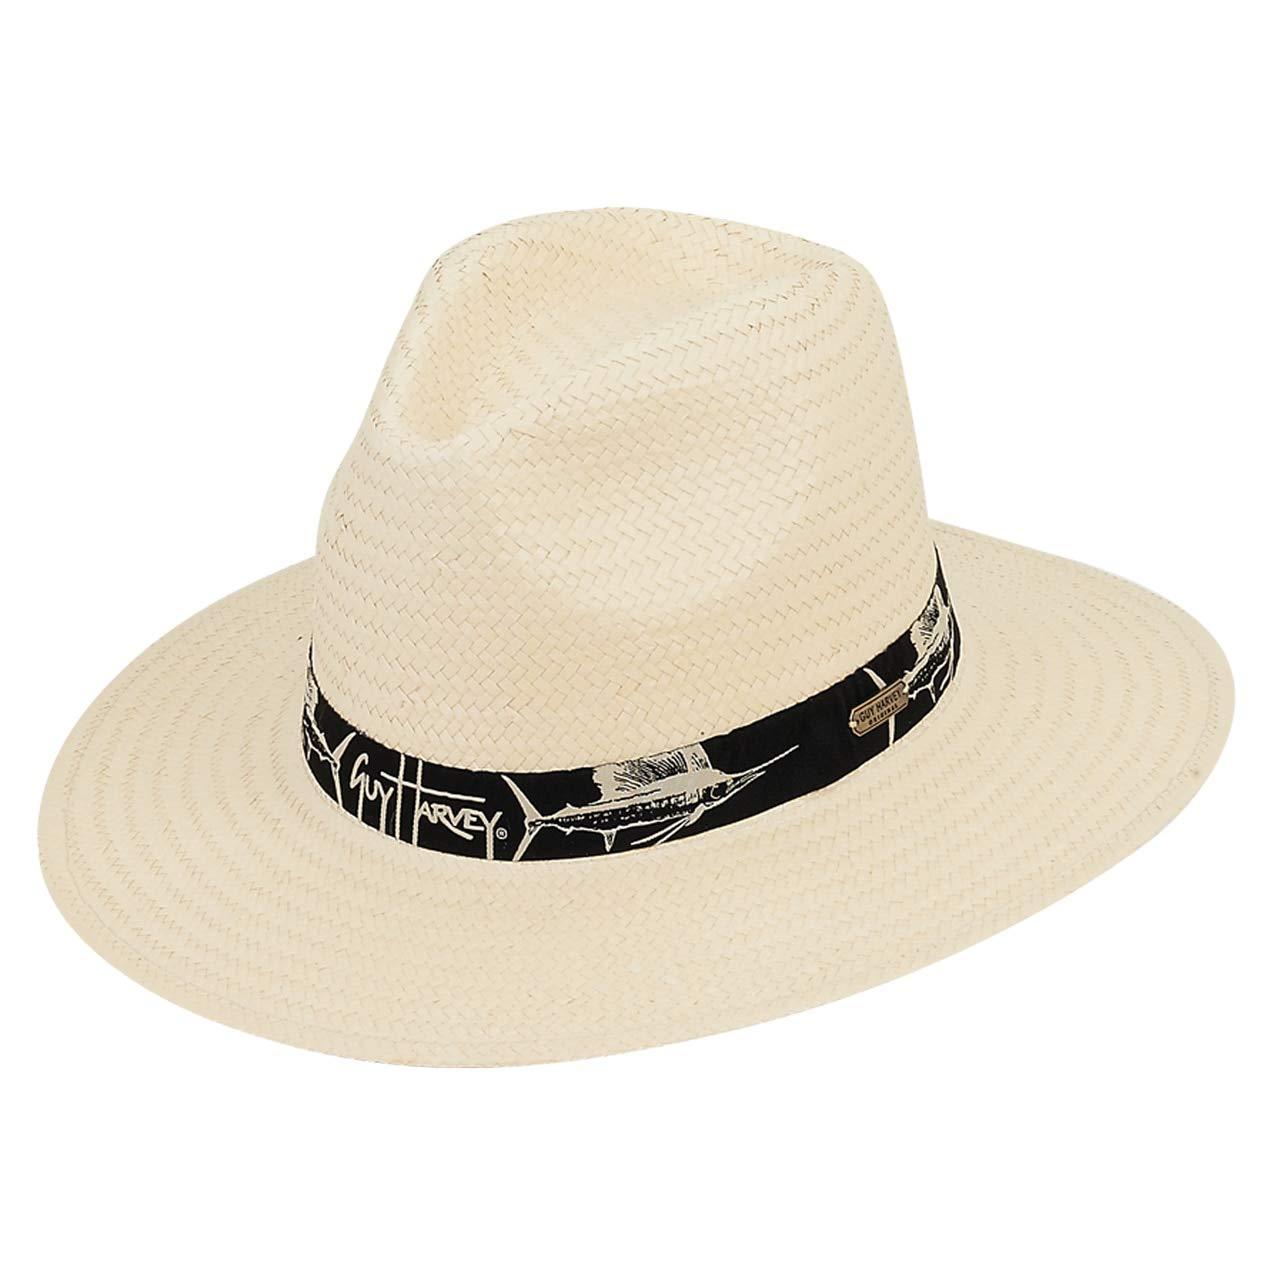 04ad01e0e7c28 Guy Harvey Mens Sun Hat Woven Ribbon Brim 3